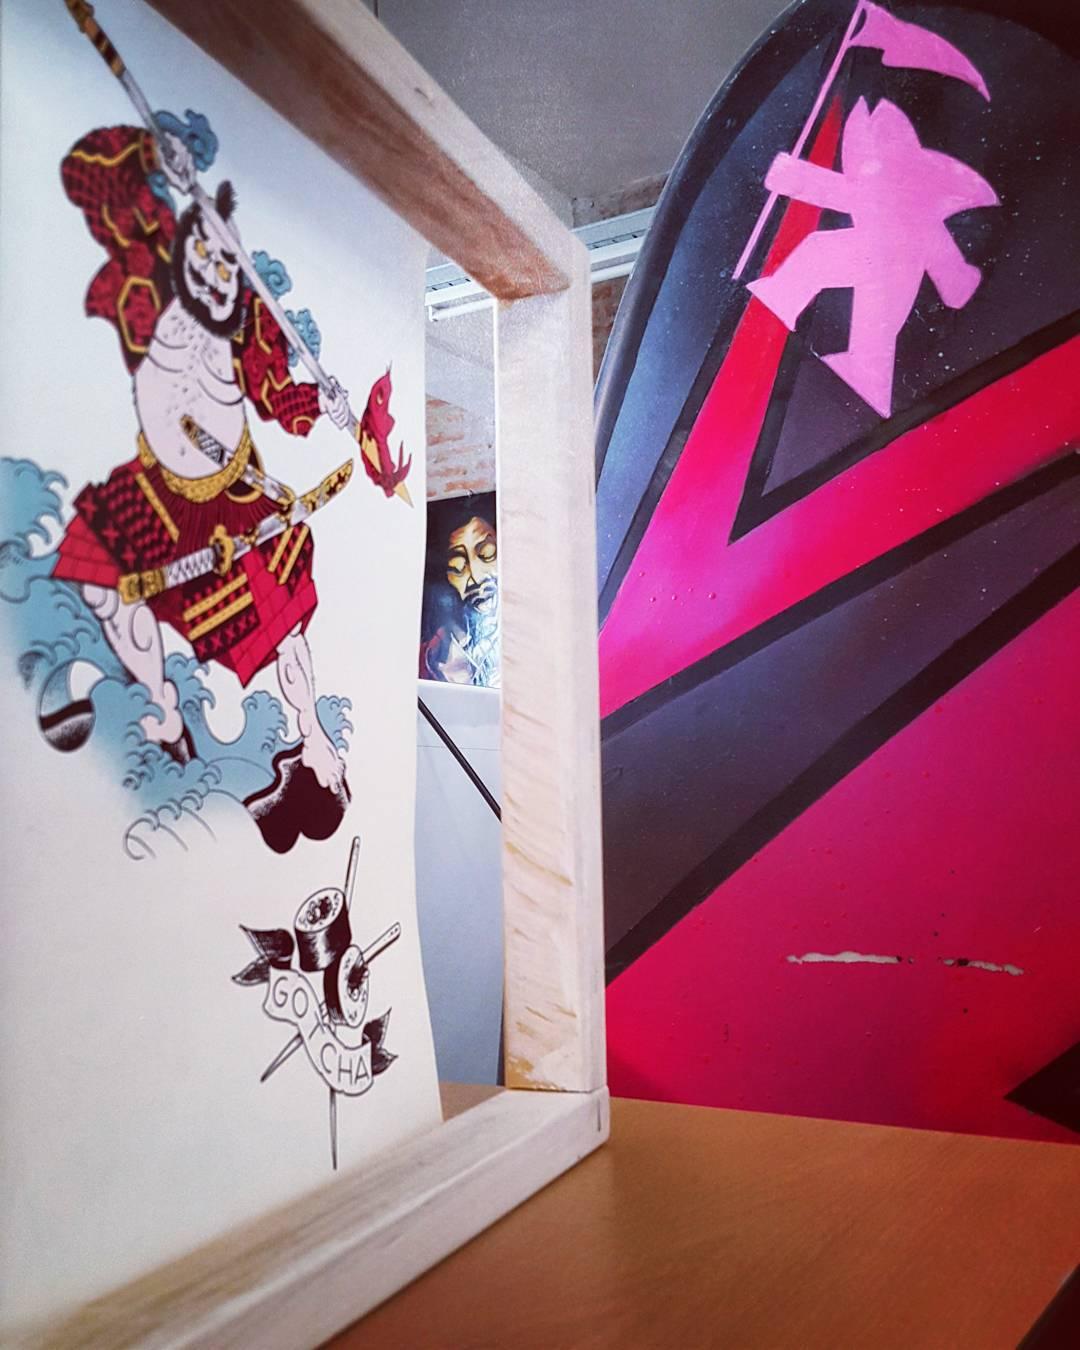 Original Prints @gotchaarg // #surf #skate #music #art #fun